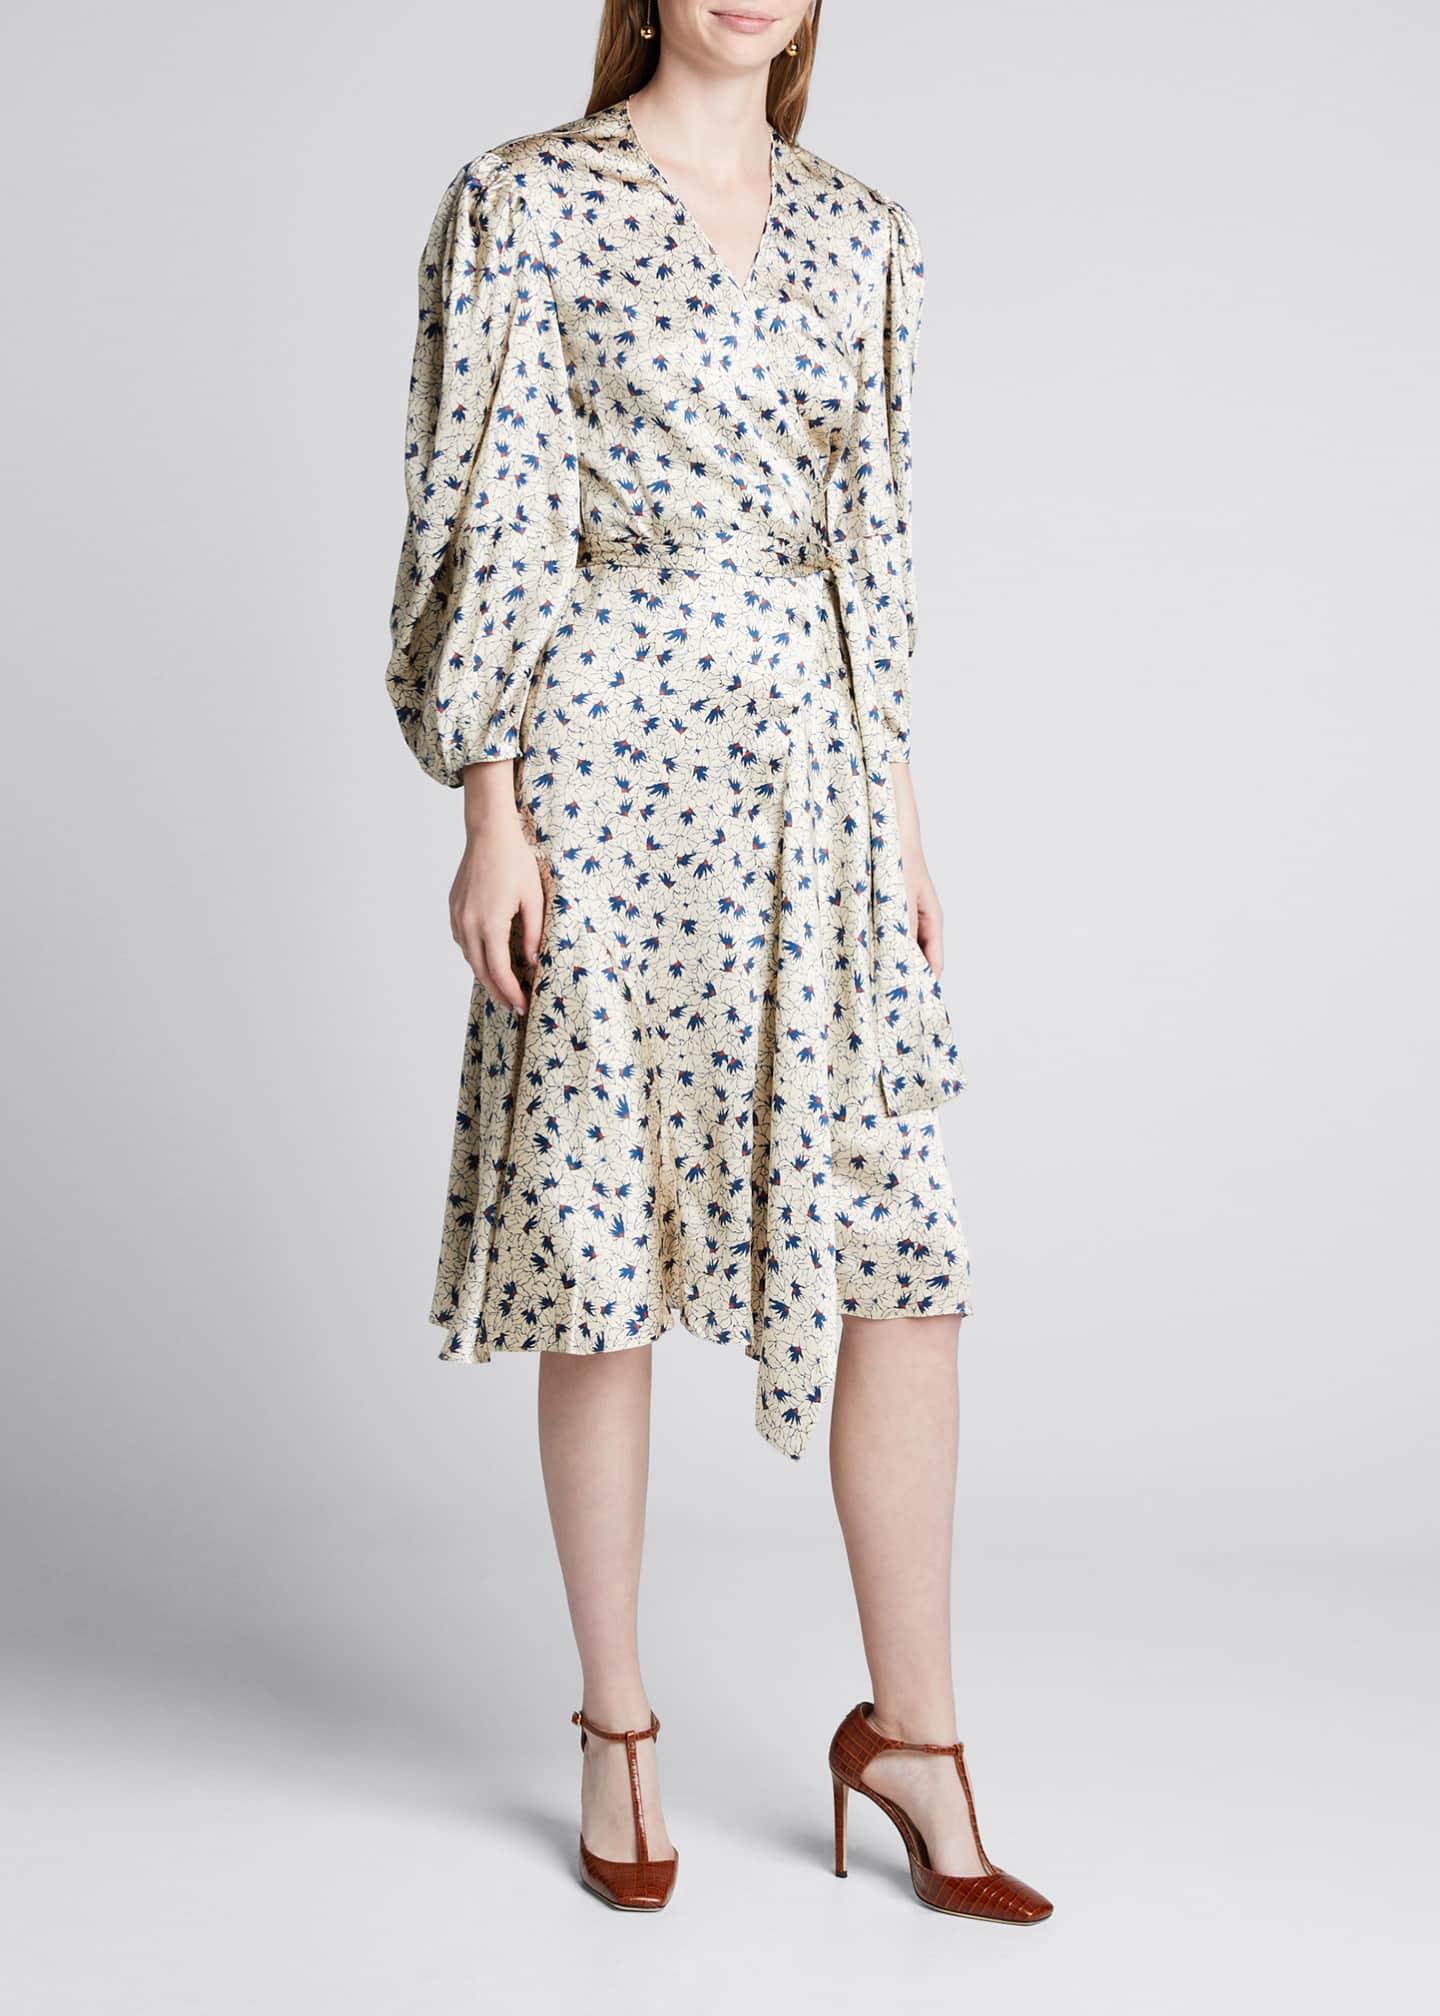 Chloe Silk 3/4-Sleeve Wrap Dress